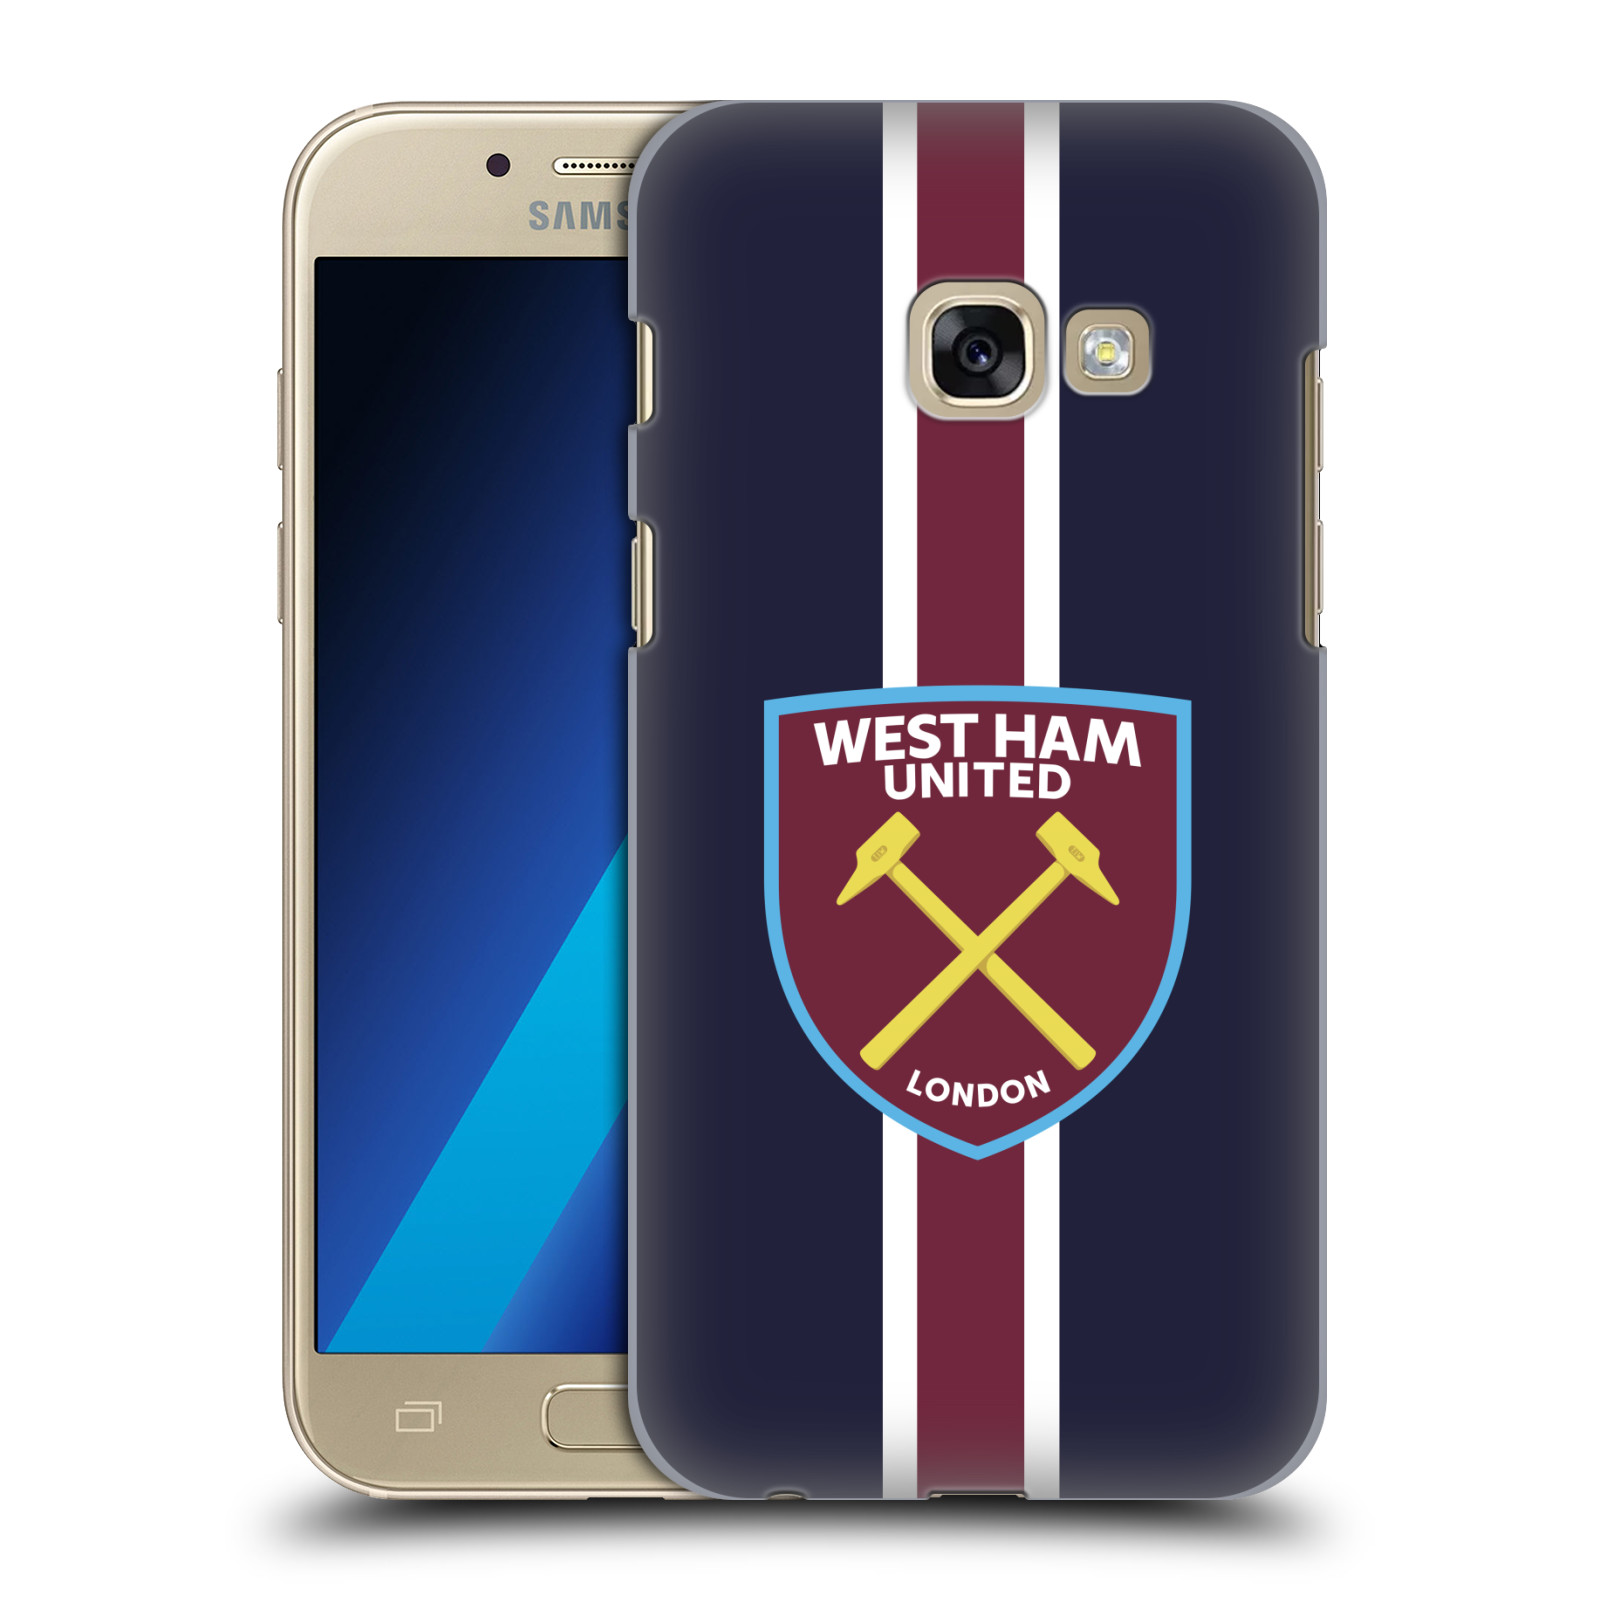 Plastové pouzdro na mobil Samsung Galaxy A3 (2017) - Head Case - West Ham United - Pruhy